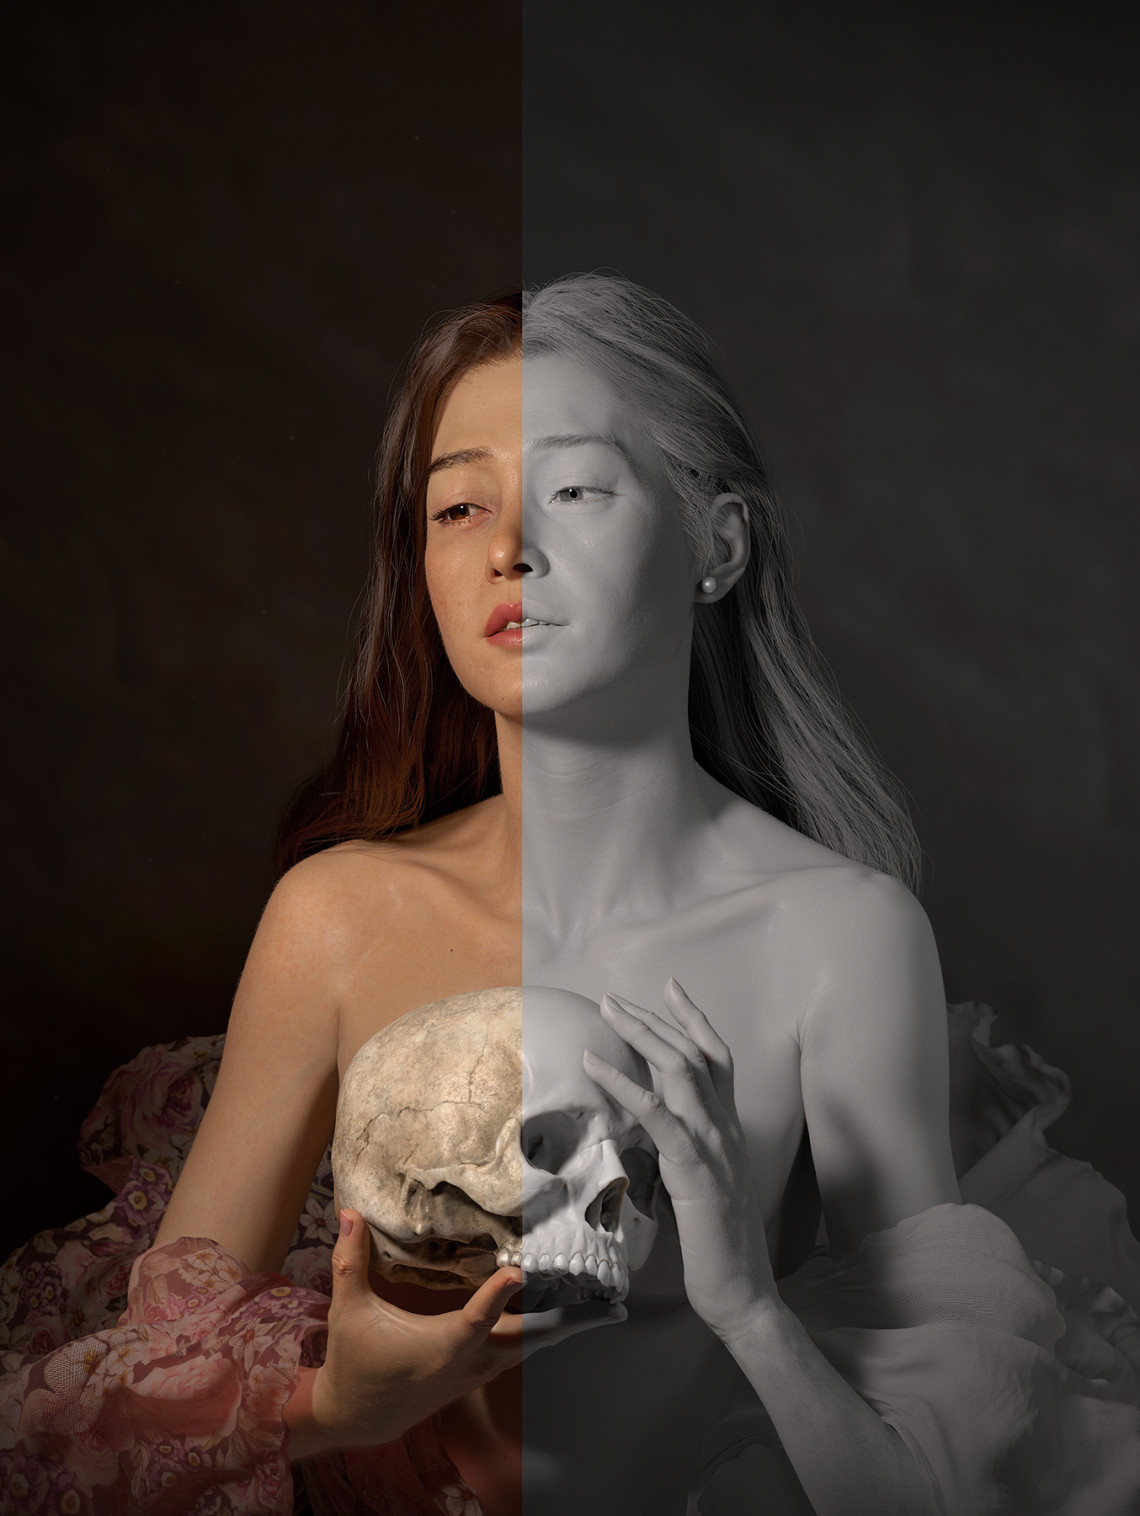 写实风格女性角色作品《接近星星》    设计师:Patiphan Sottiwilaiphong